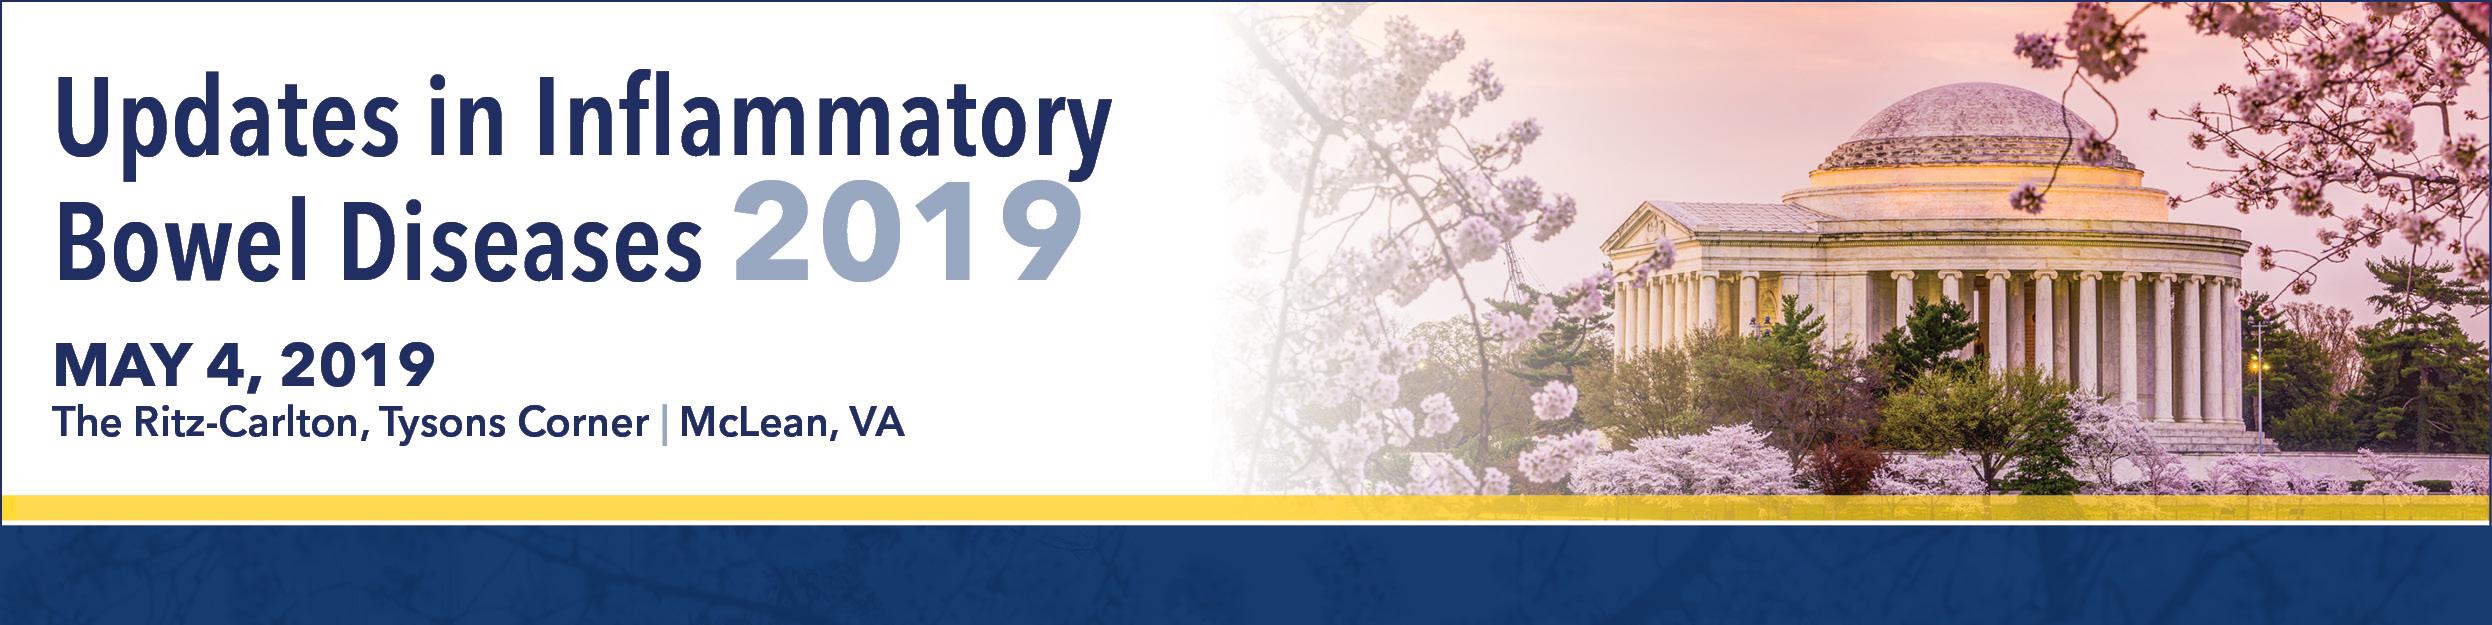 Updates in Inflammatory Bowel Diseases 2019 Banner